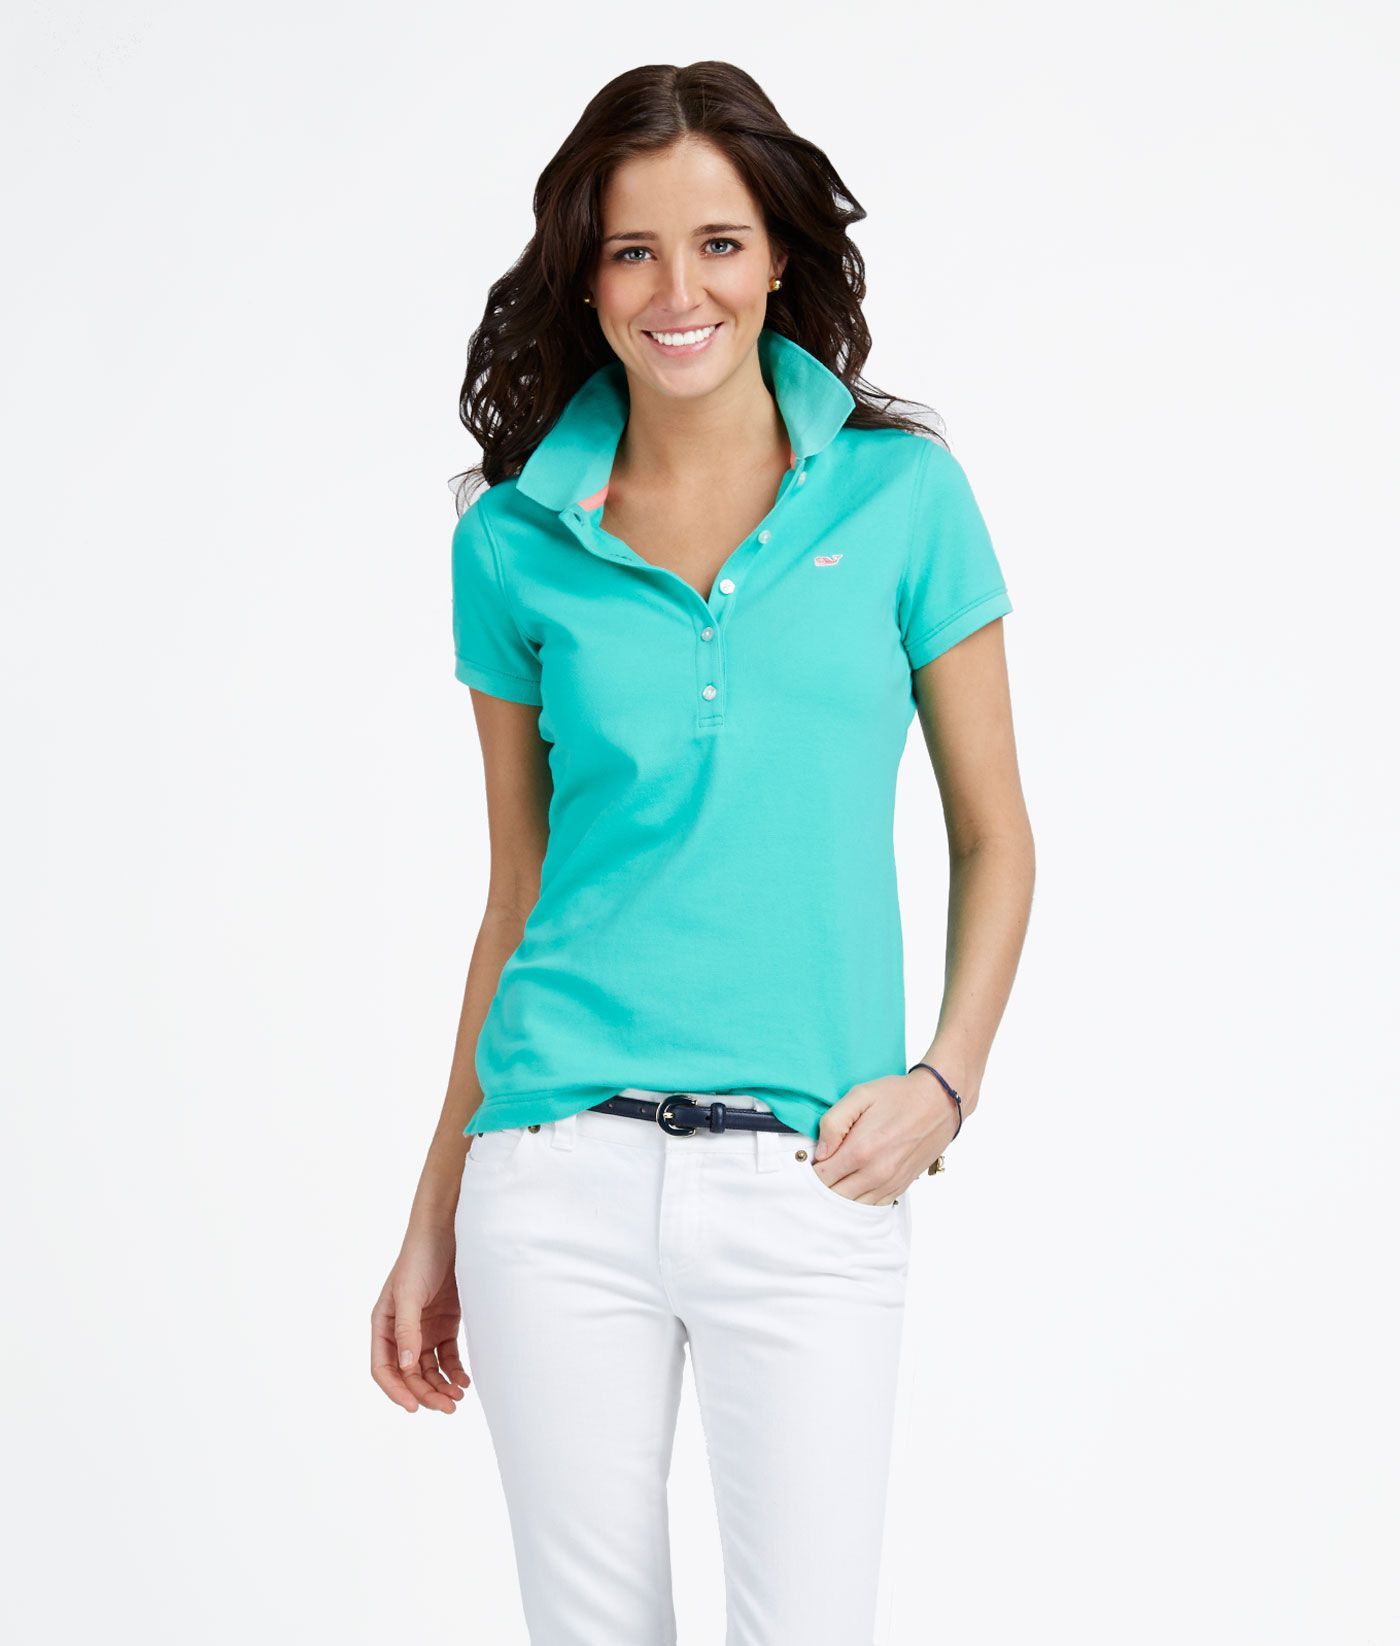 20e84507aa49ca Women s Polo Shirts  Shoreline Short-Sleeve Polo for Women - Vineyard Vines